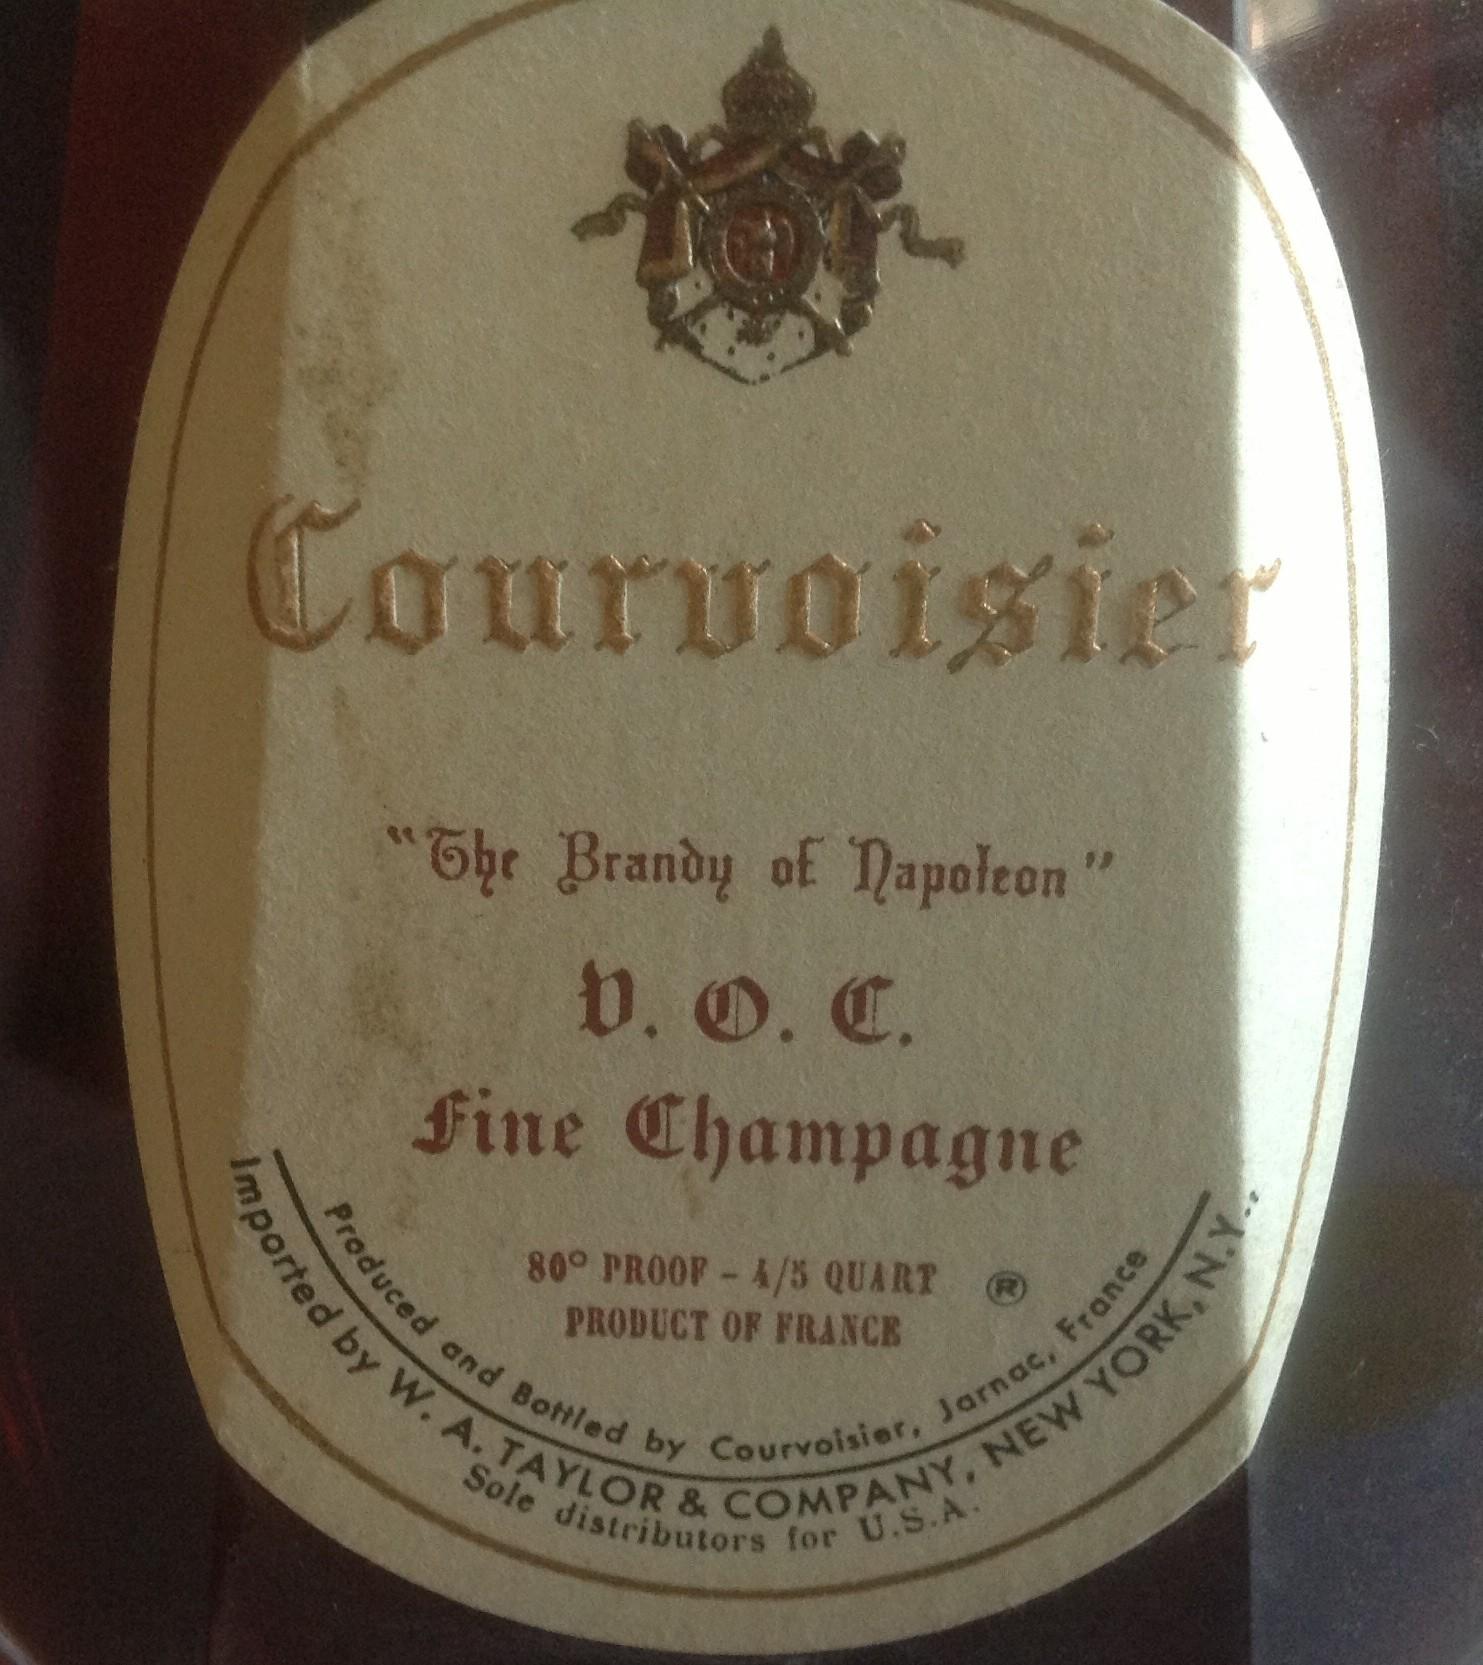 Courvoisier V.O.C. Fine Champagne Cognac